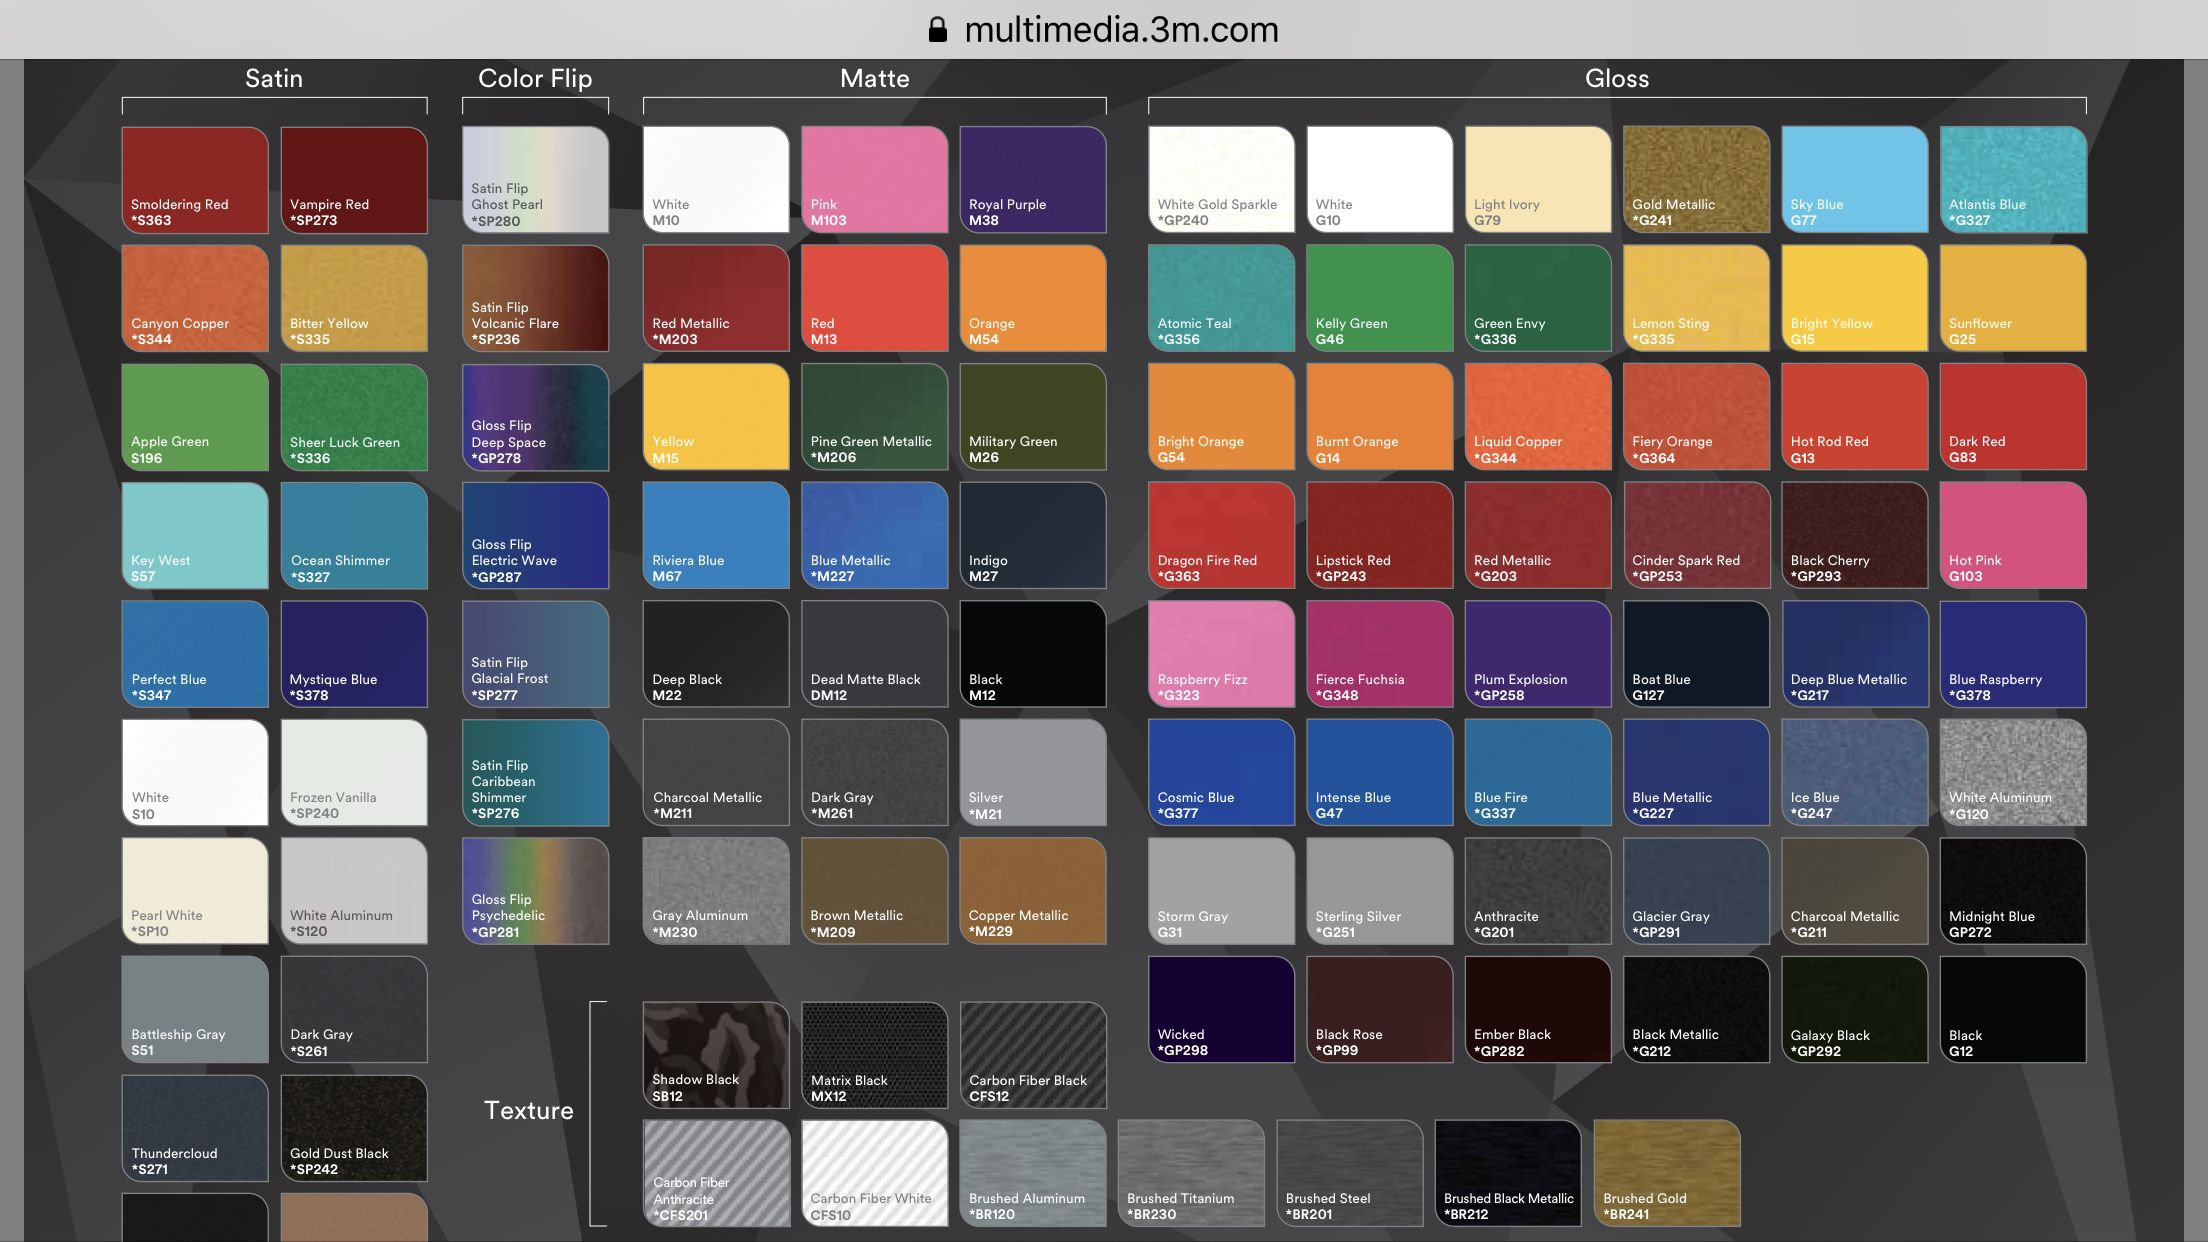 Null httpsmultimedia3mmwsmedia752048o3m wrap film colour chart null httpsmultimedia3mmwsmedia nvjuhfo Choice Image